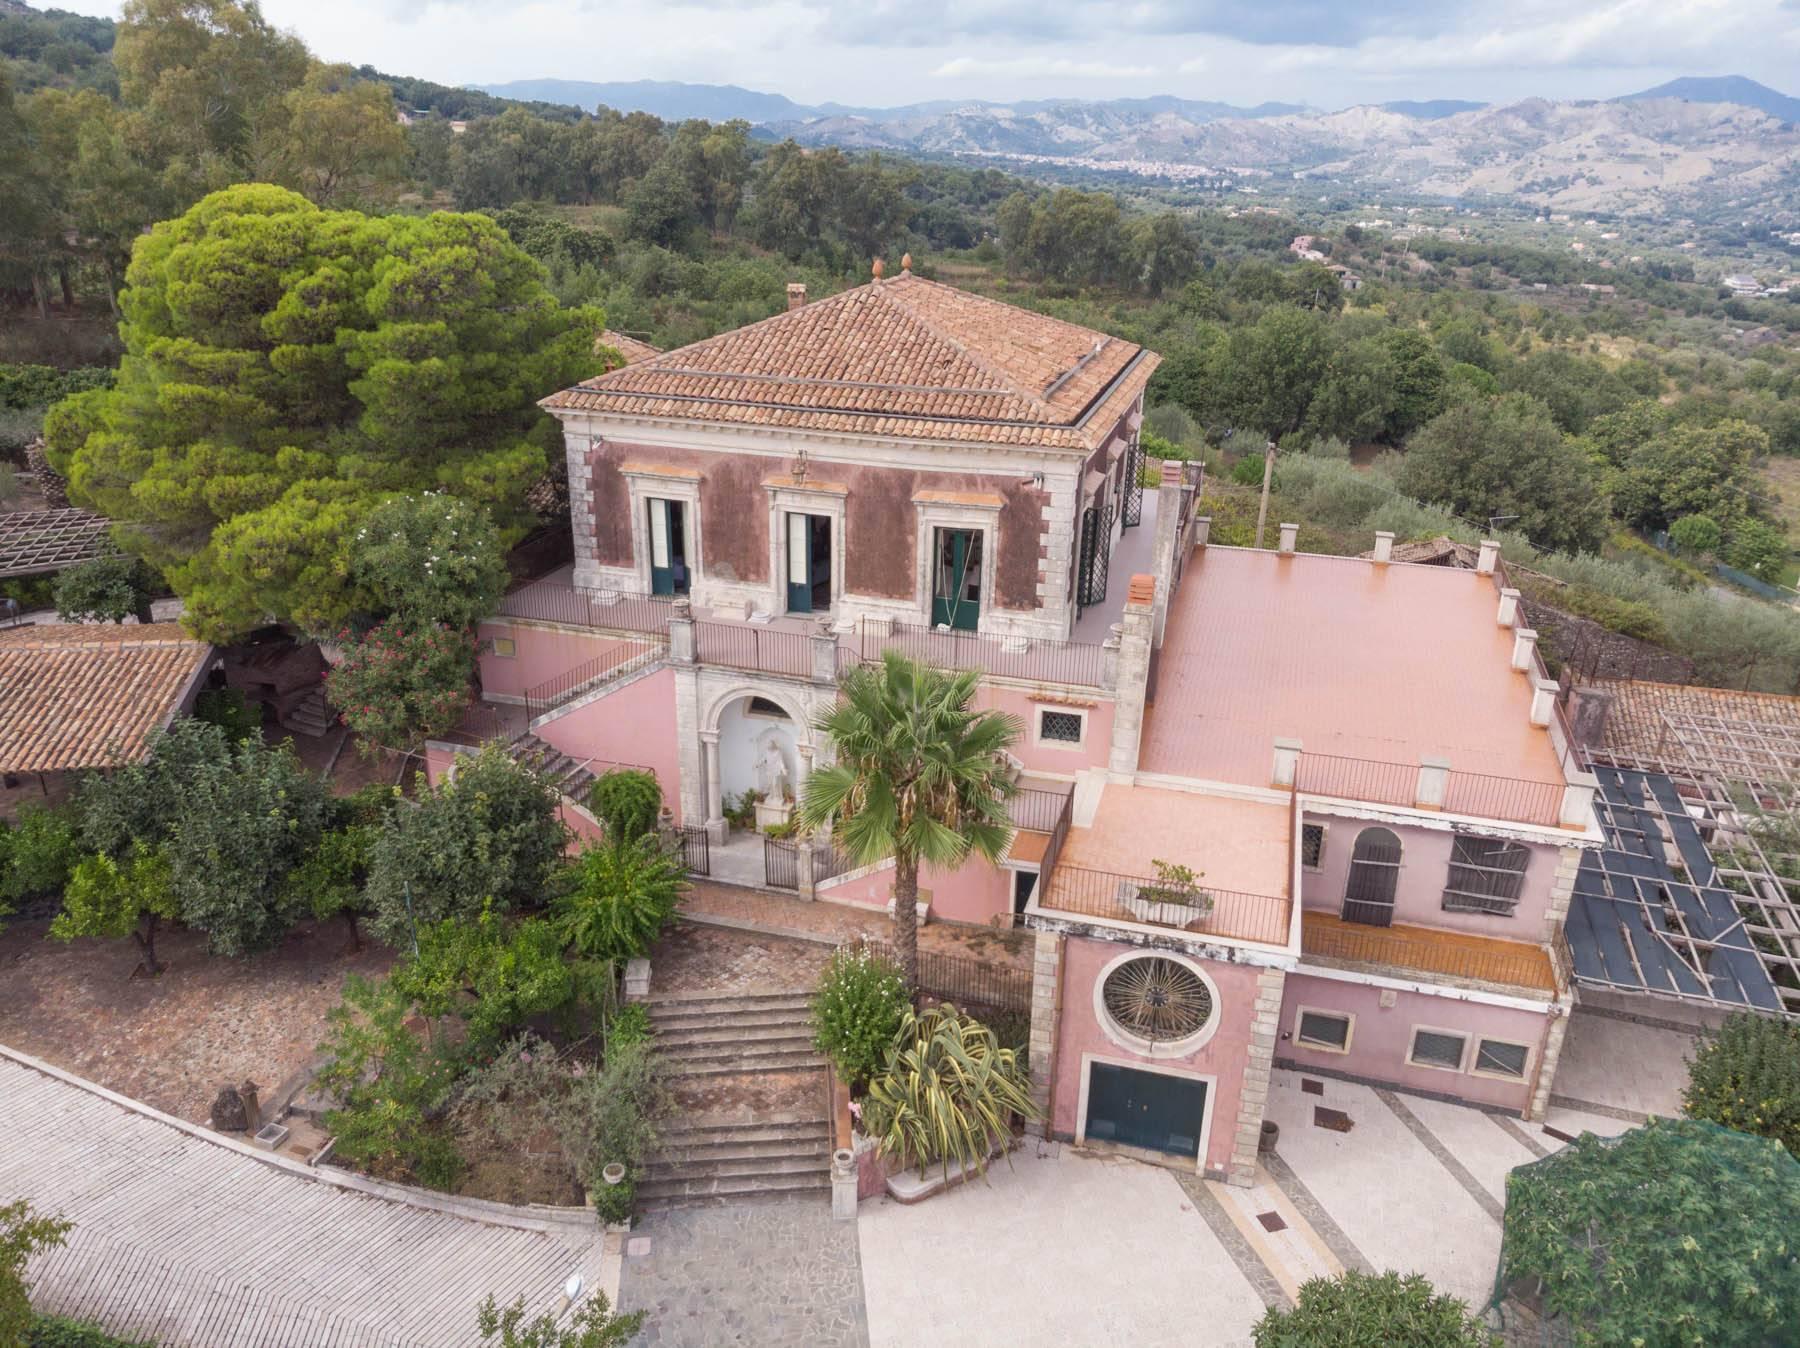 Magnifique Villa sur les pentes de l'Etna - 1